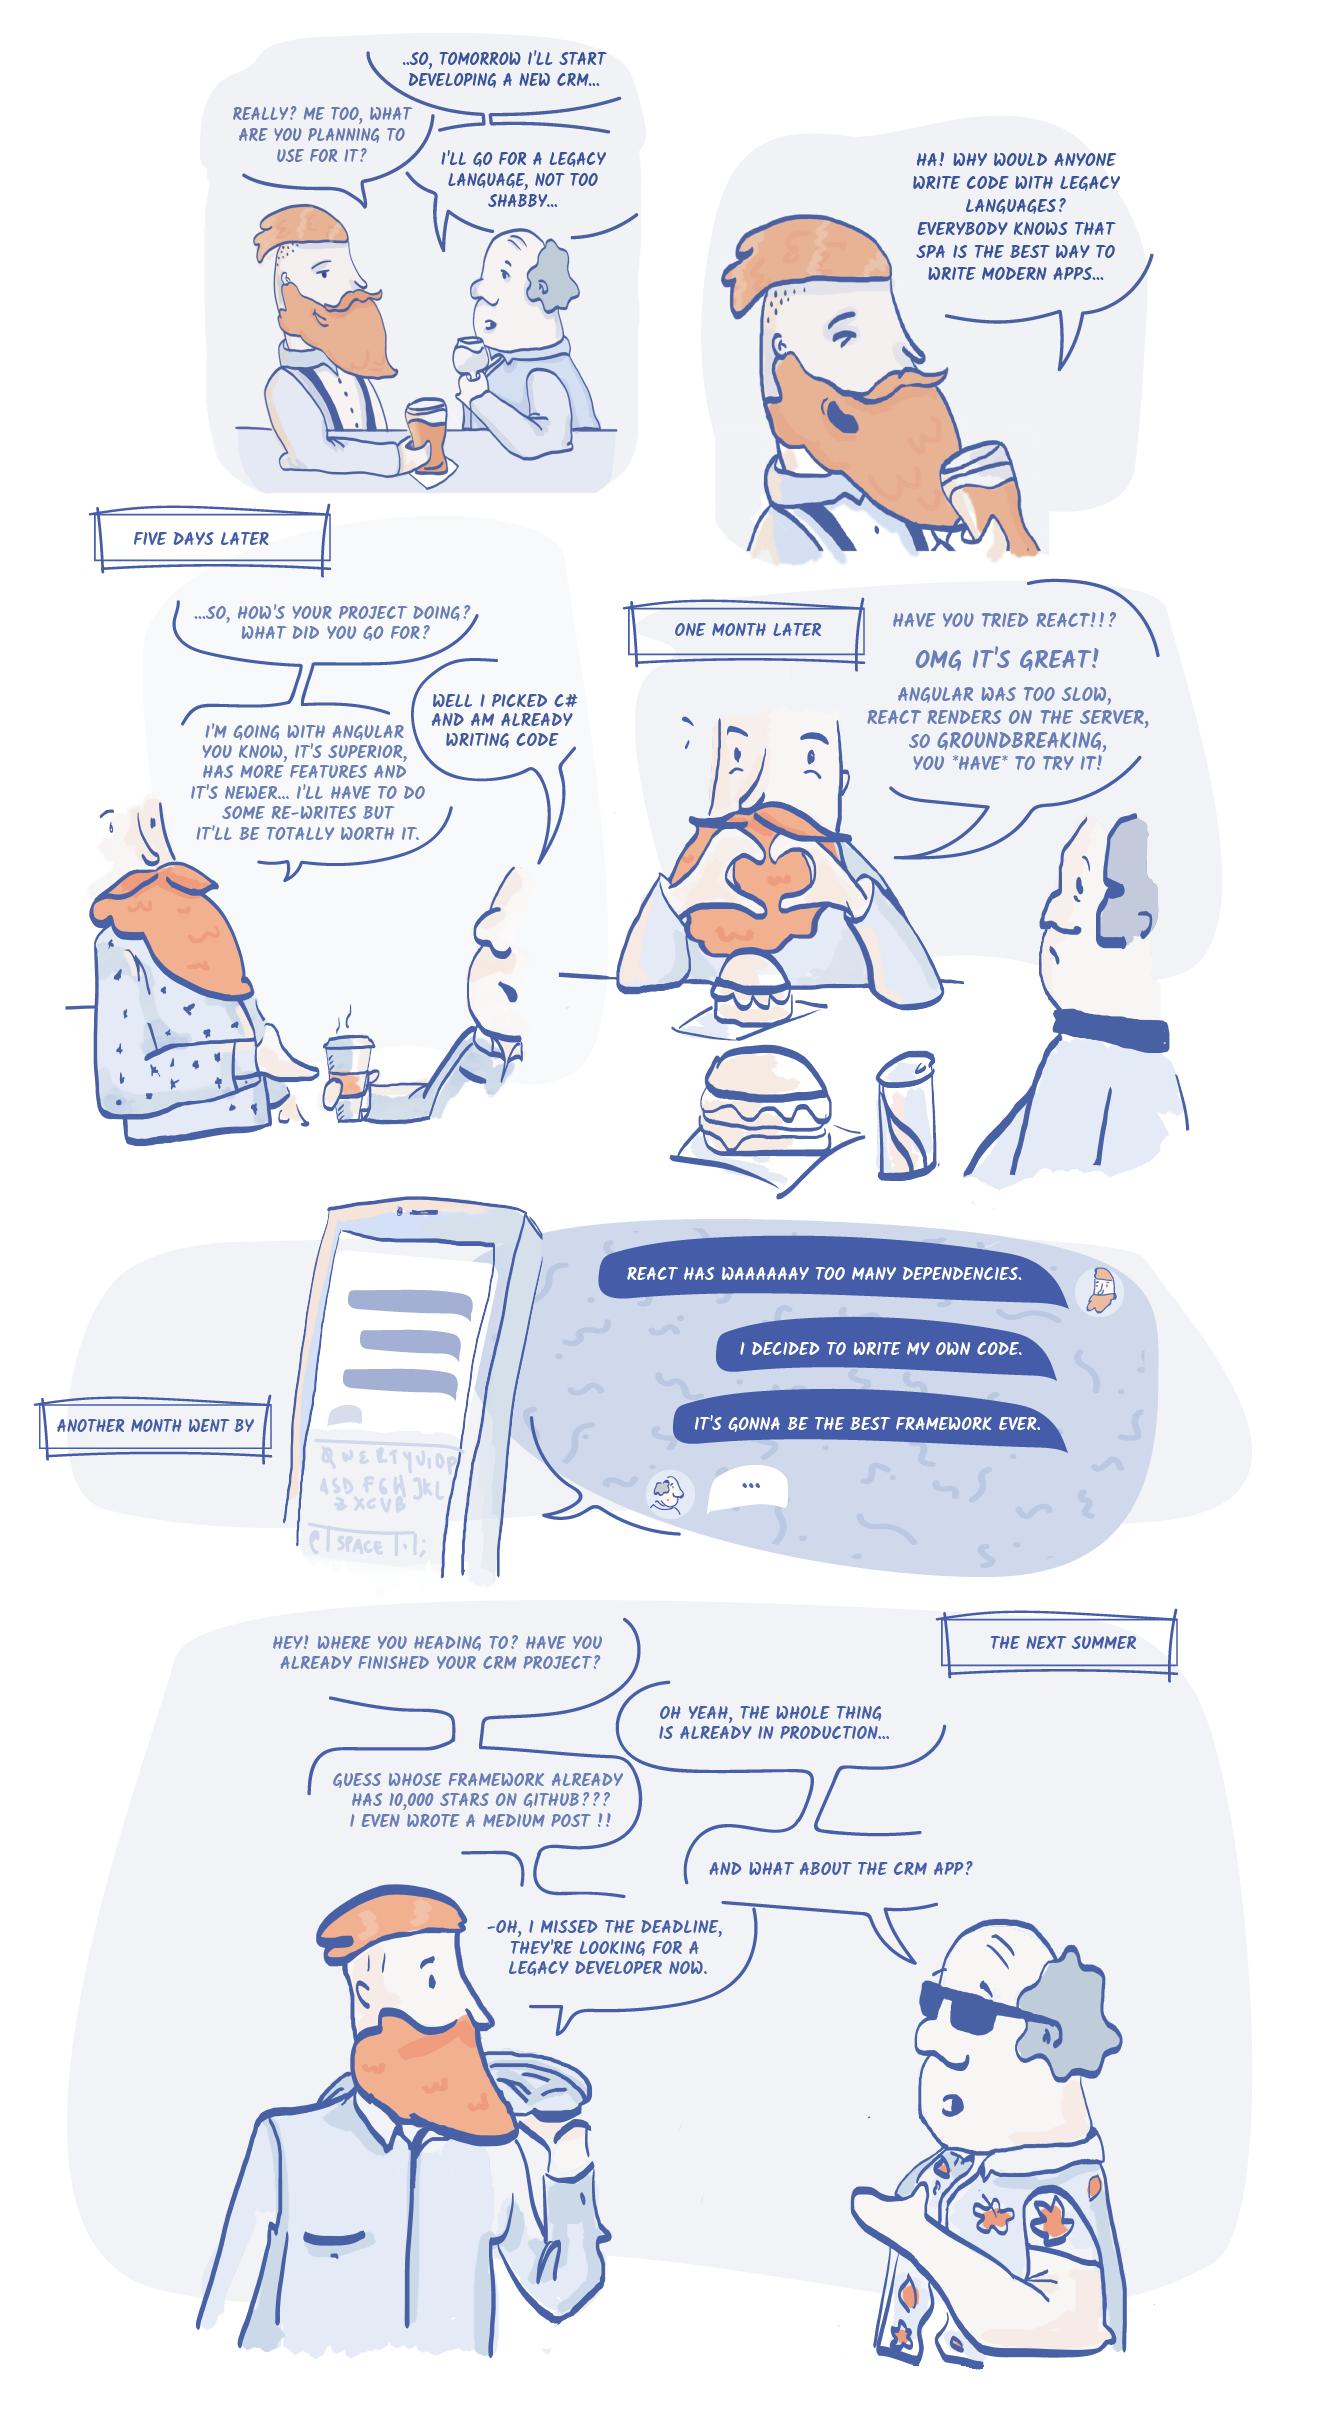 JavaScript fatigue comic